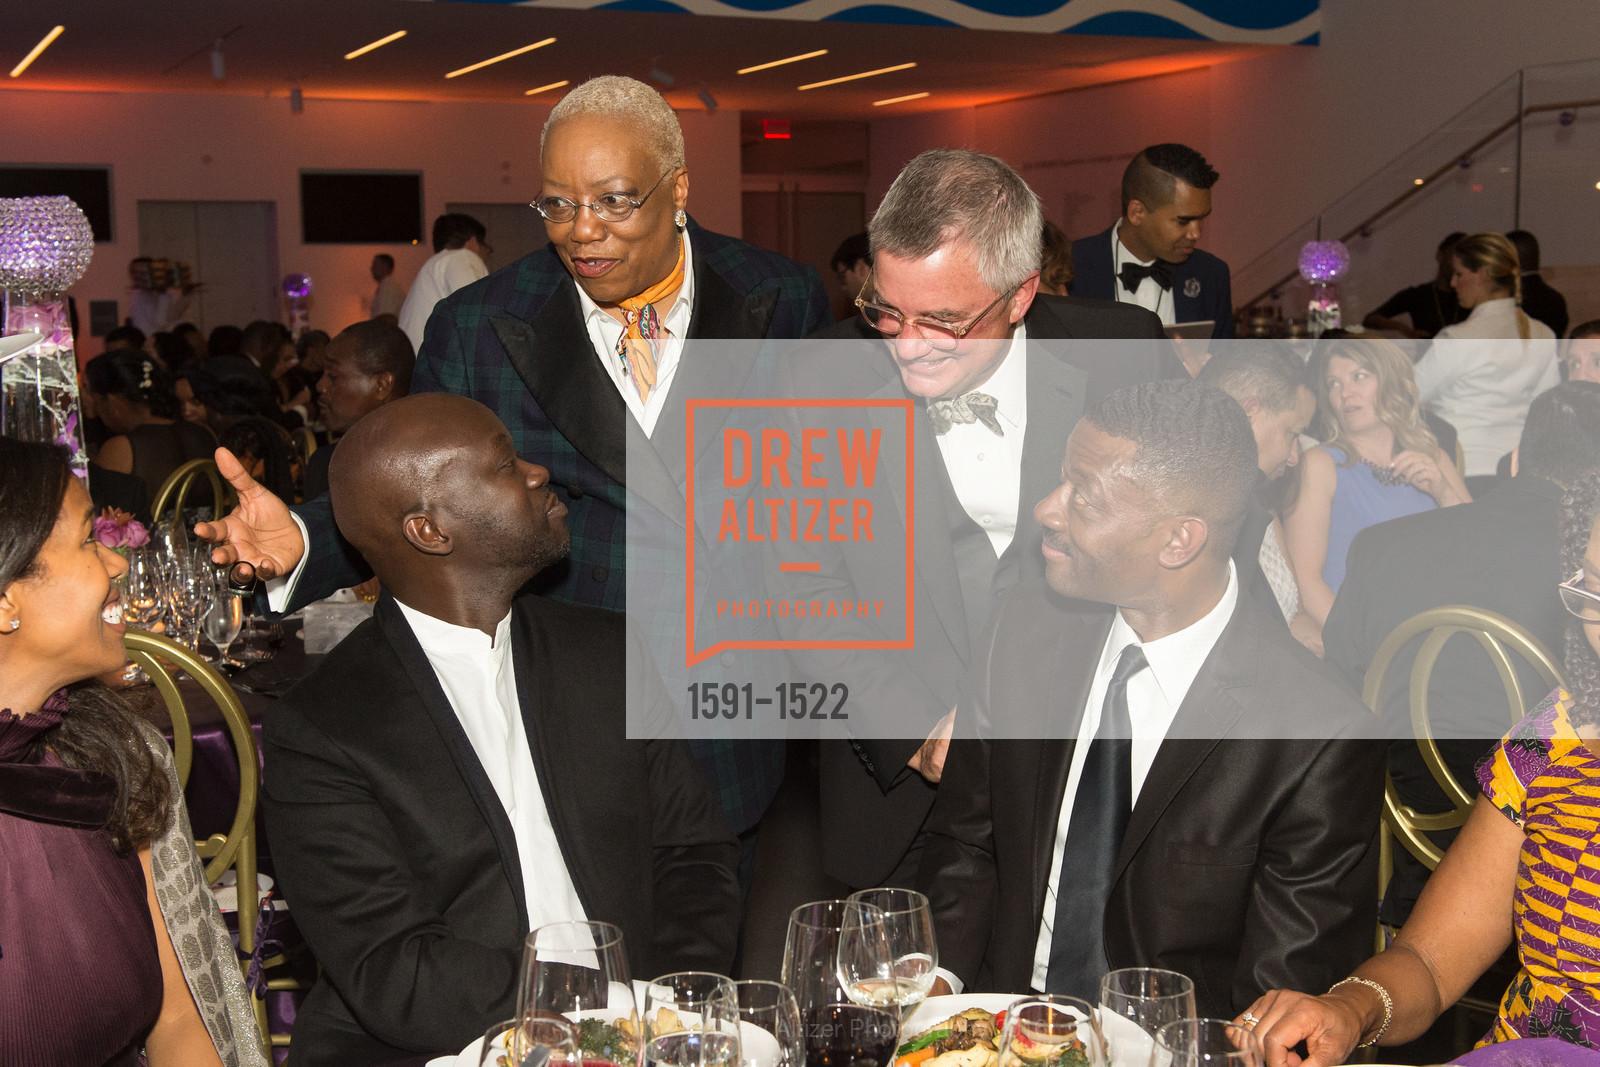 David Adjaye, Linda Harrison, Kofi Bonner, Photo #1591-1522